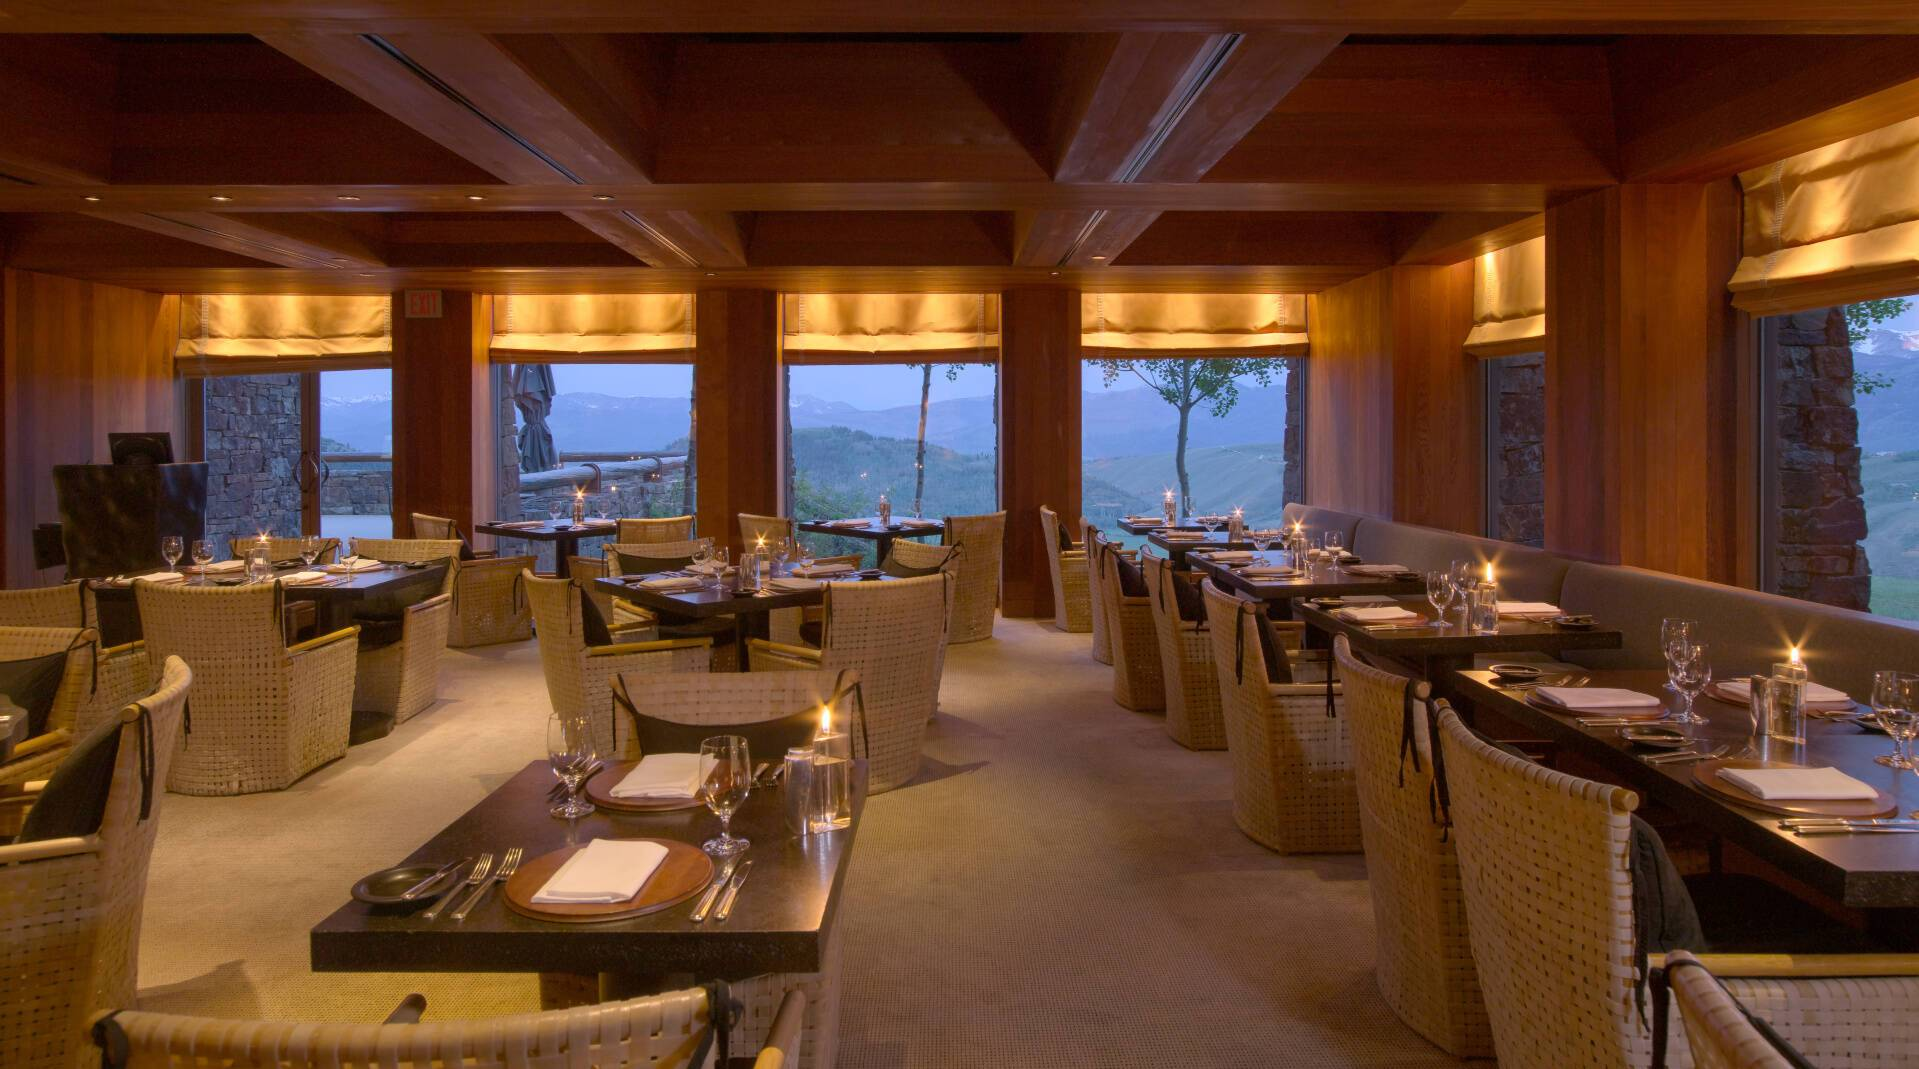 Amangani Restaurant The Grill Etats Unis Yellowstone